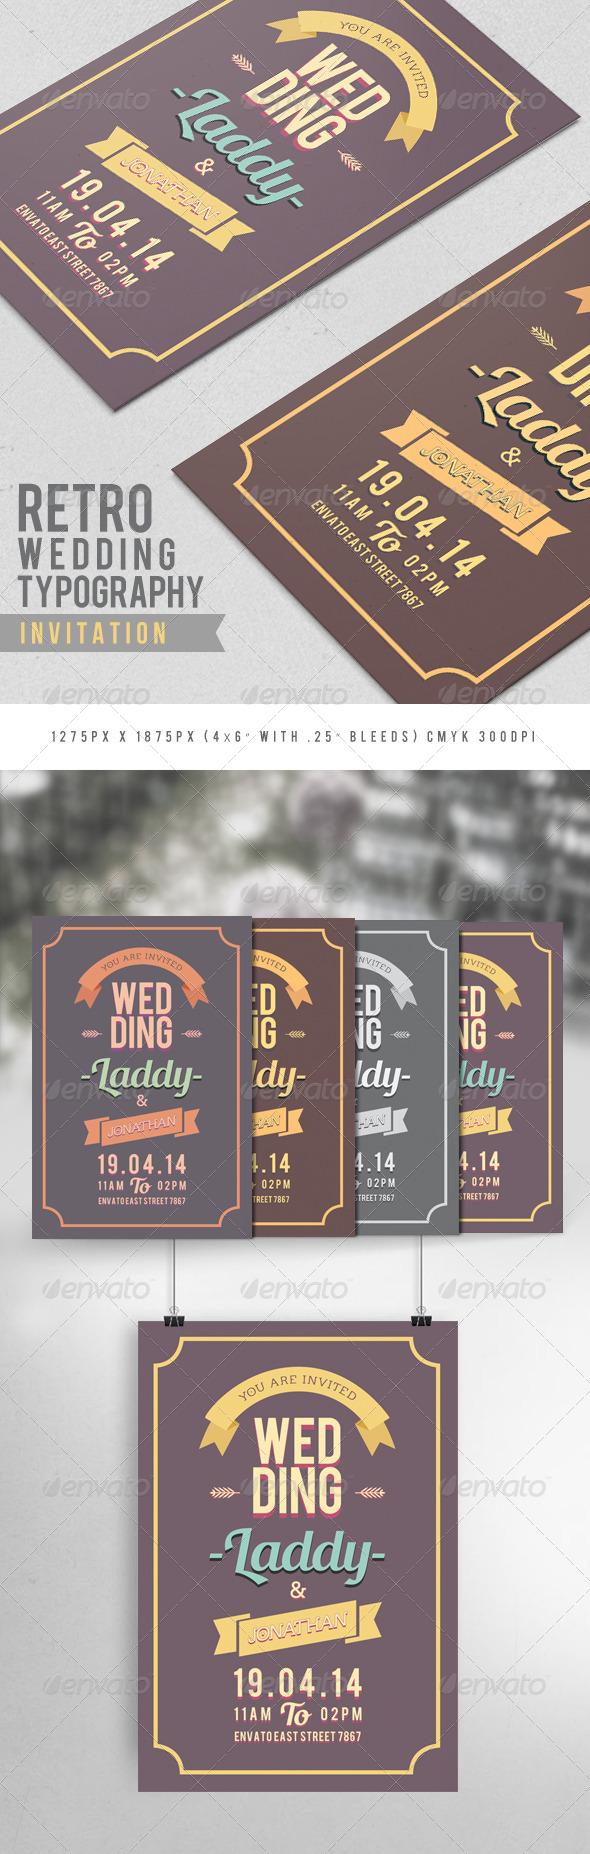 GraphicRiver Retro Wedding Typography Invitation 7934511